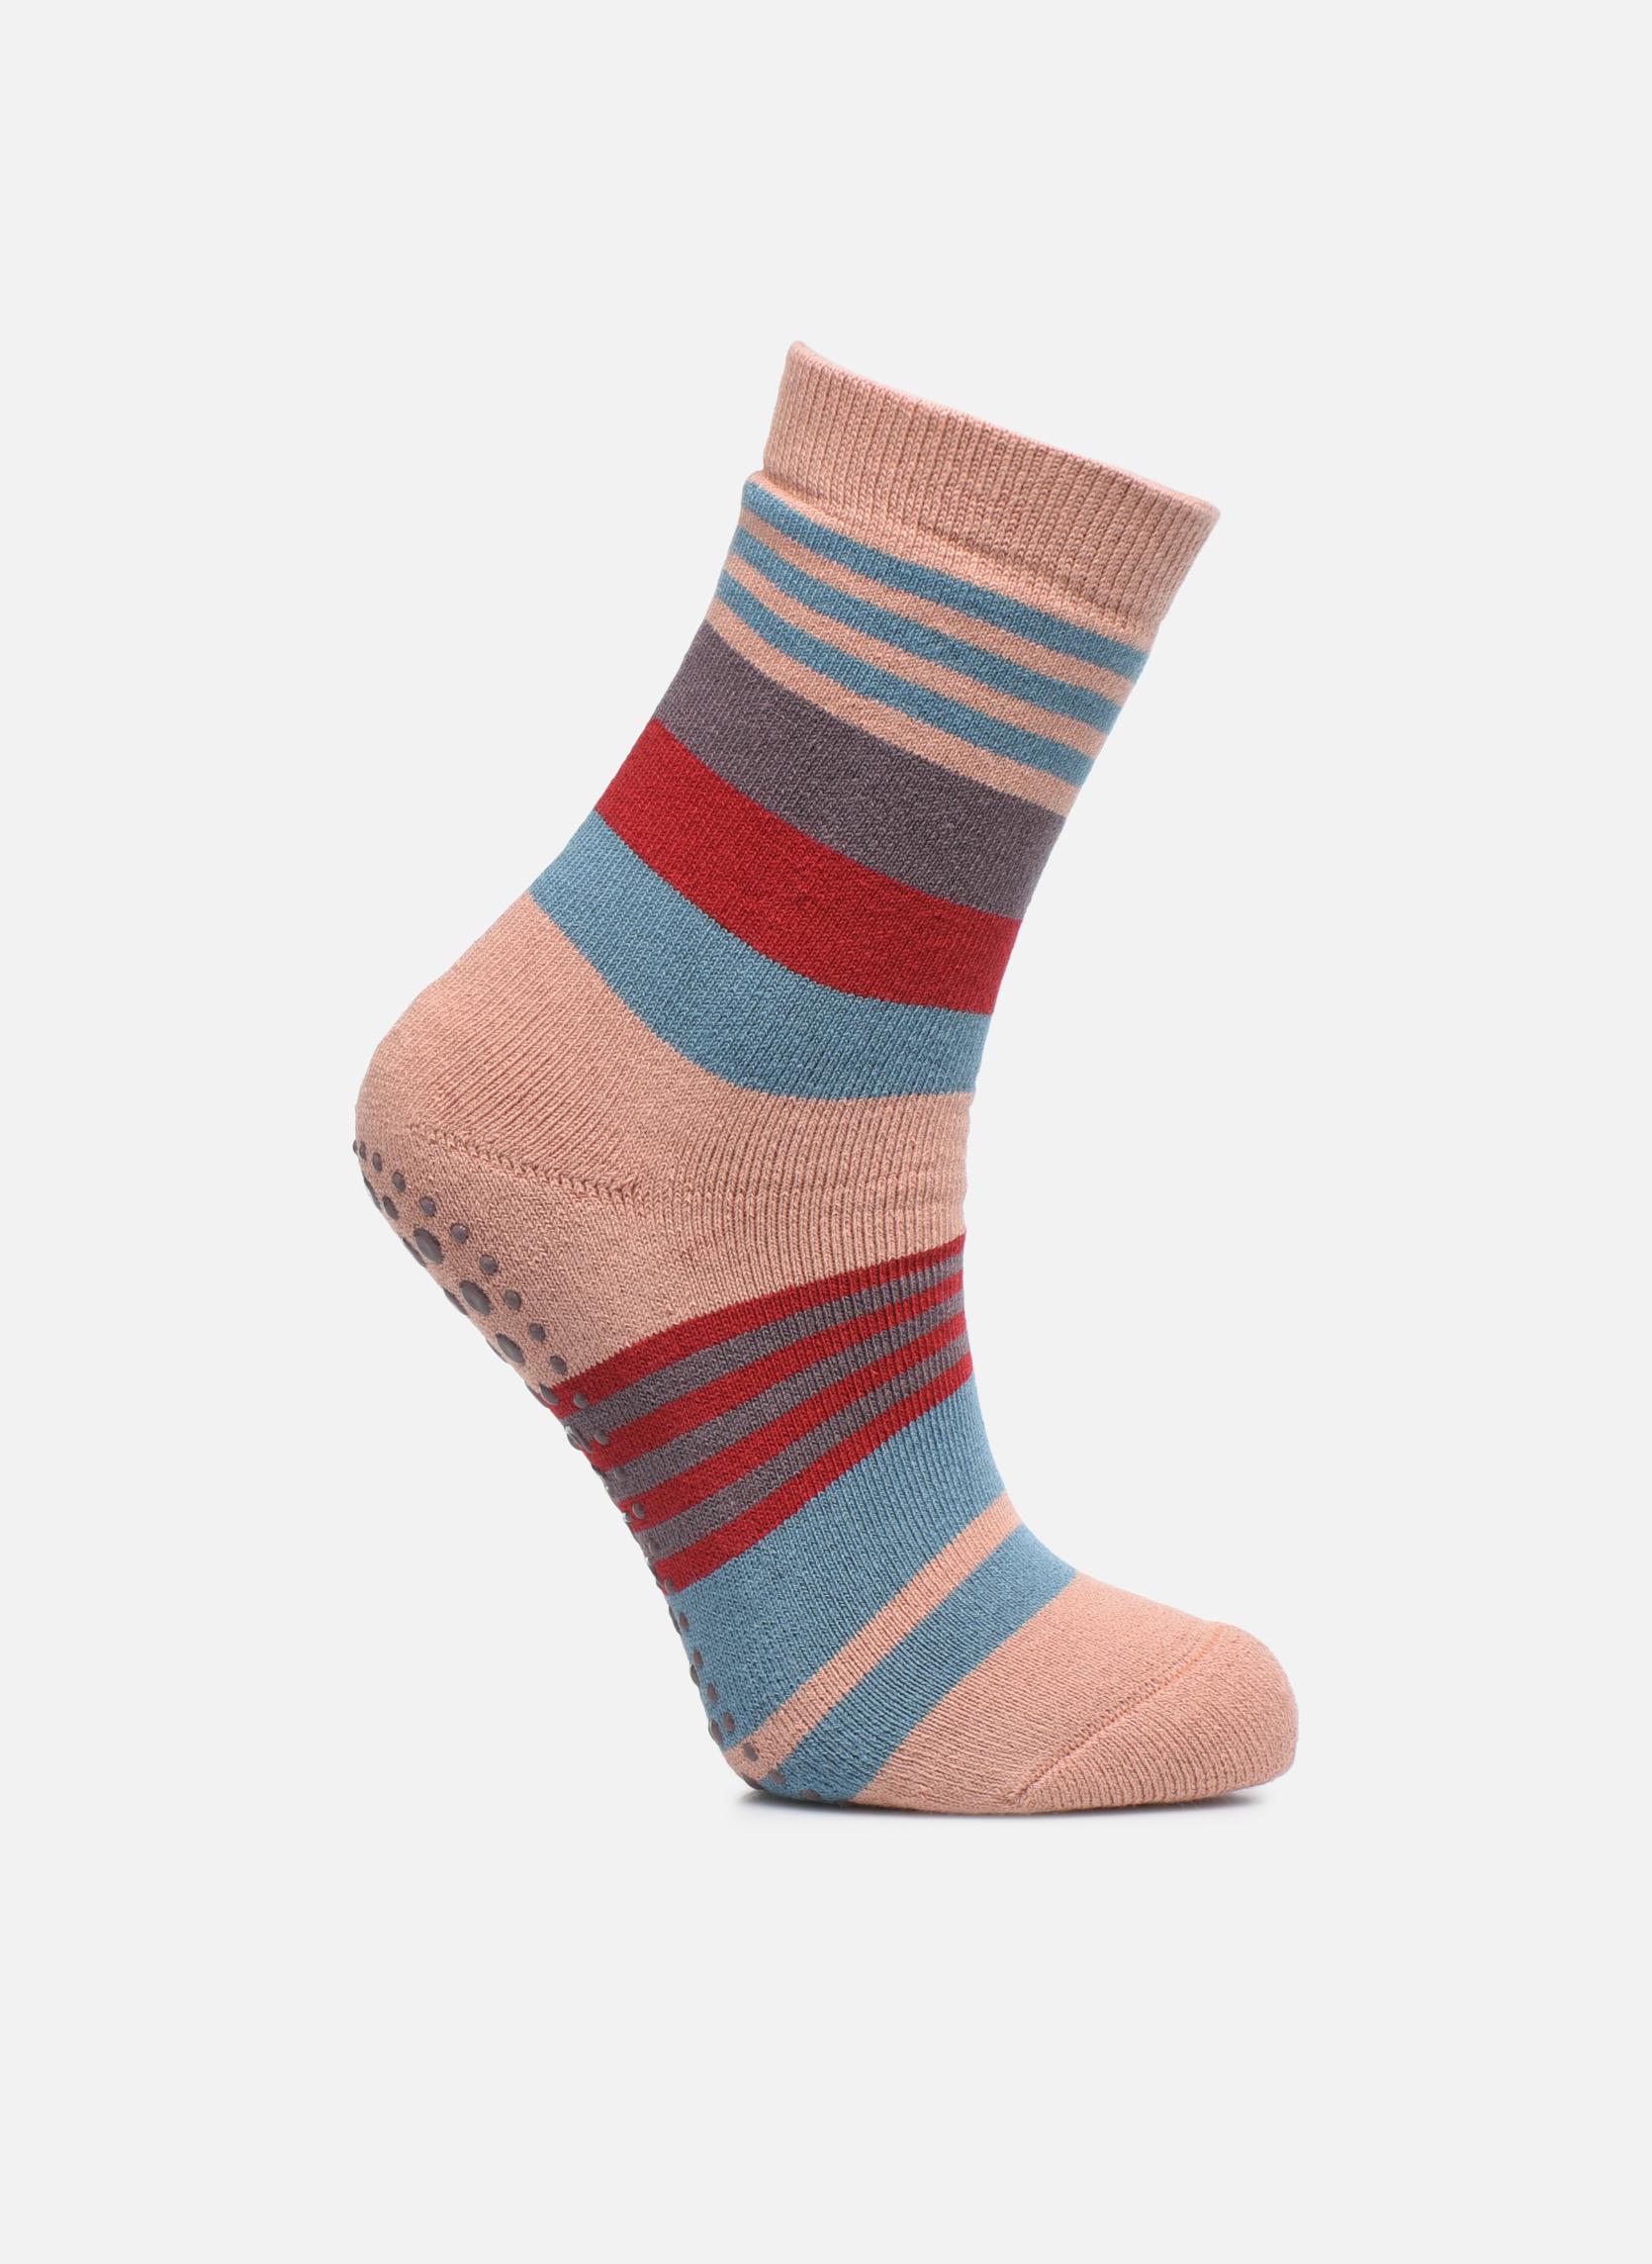 Chaussons-chaussettes Irregular Stripe Catspads